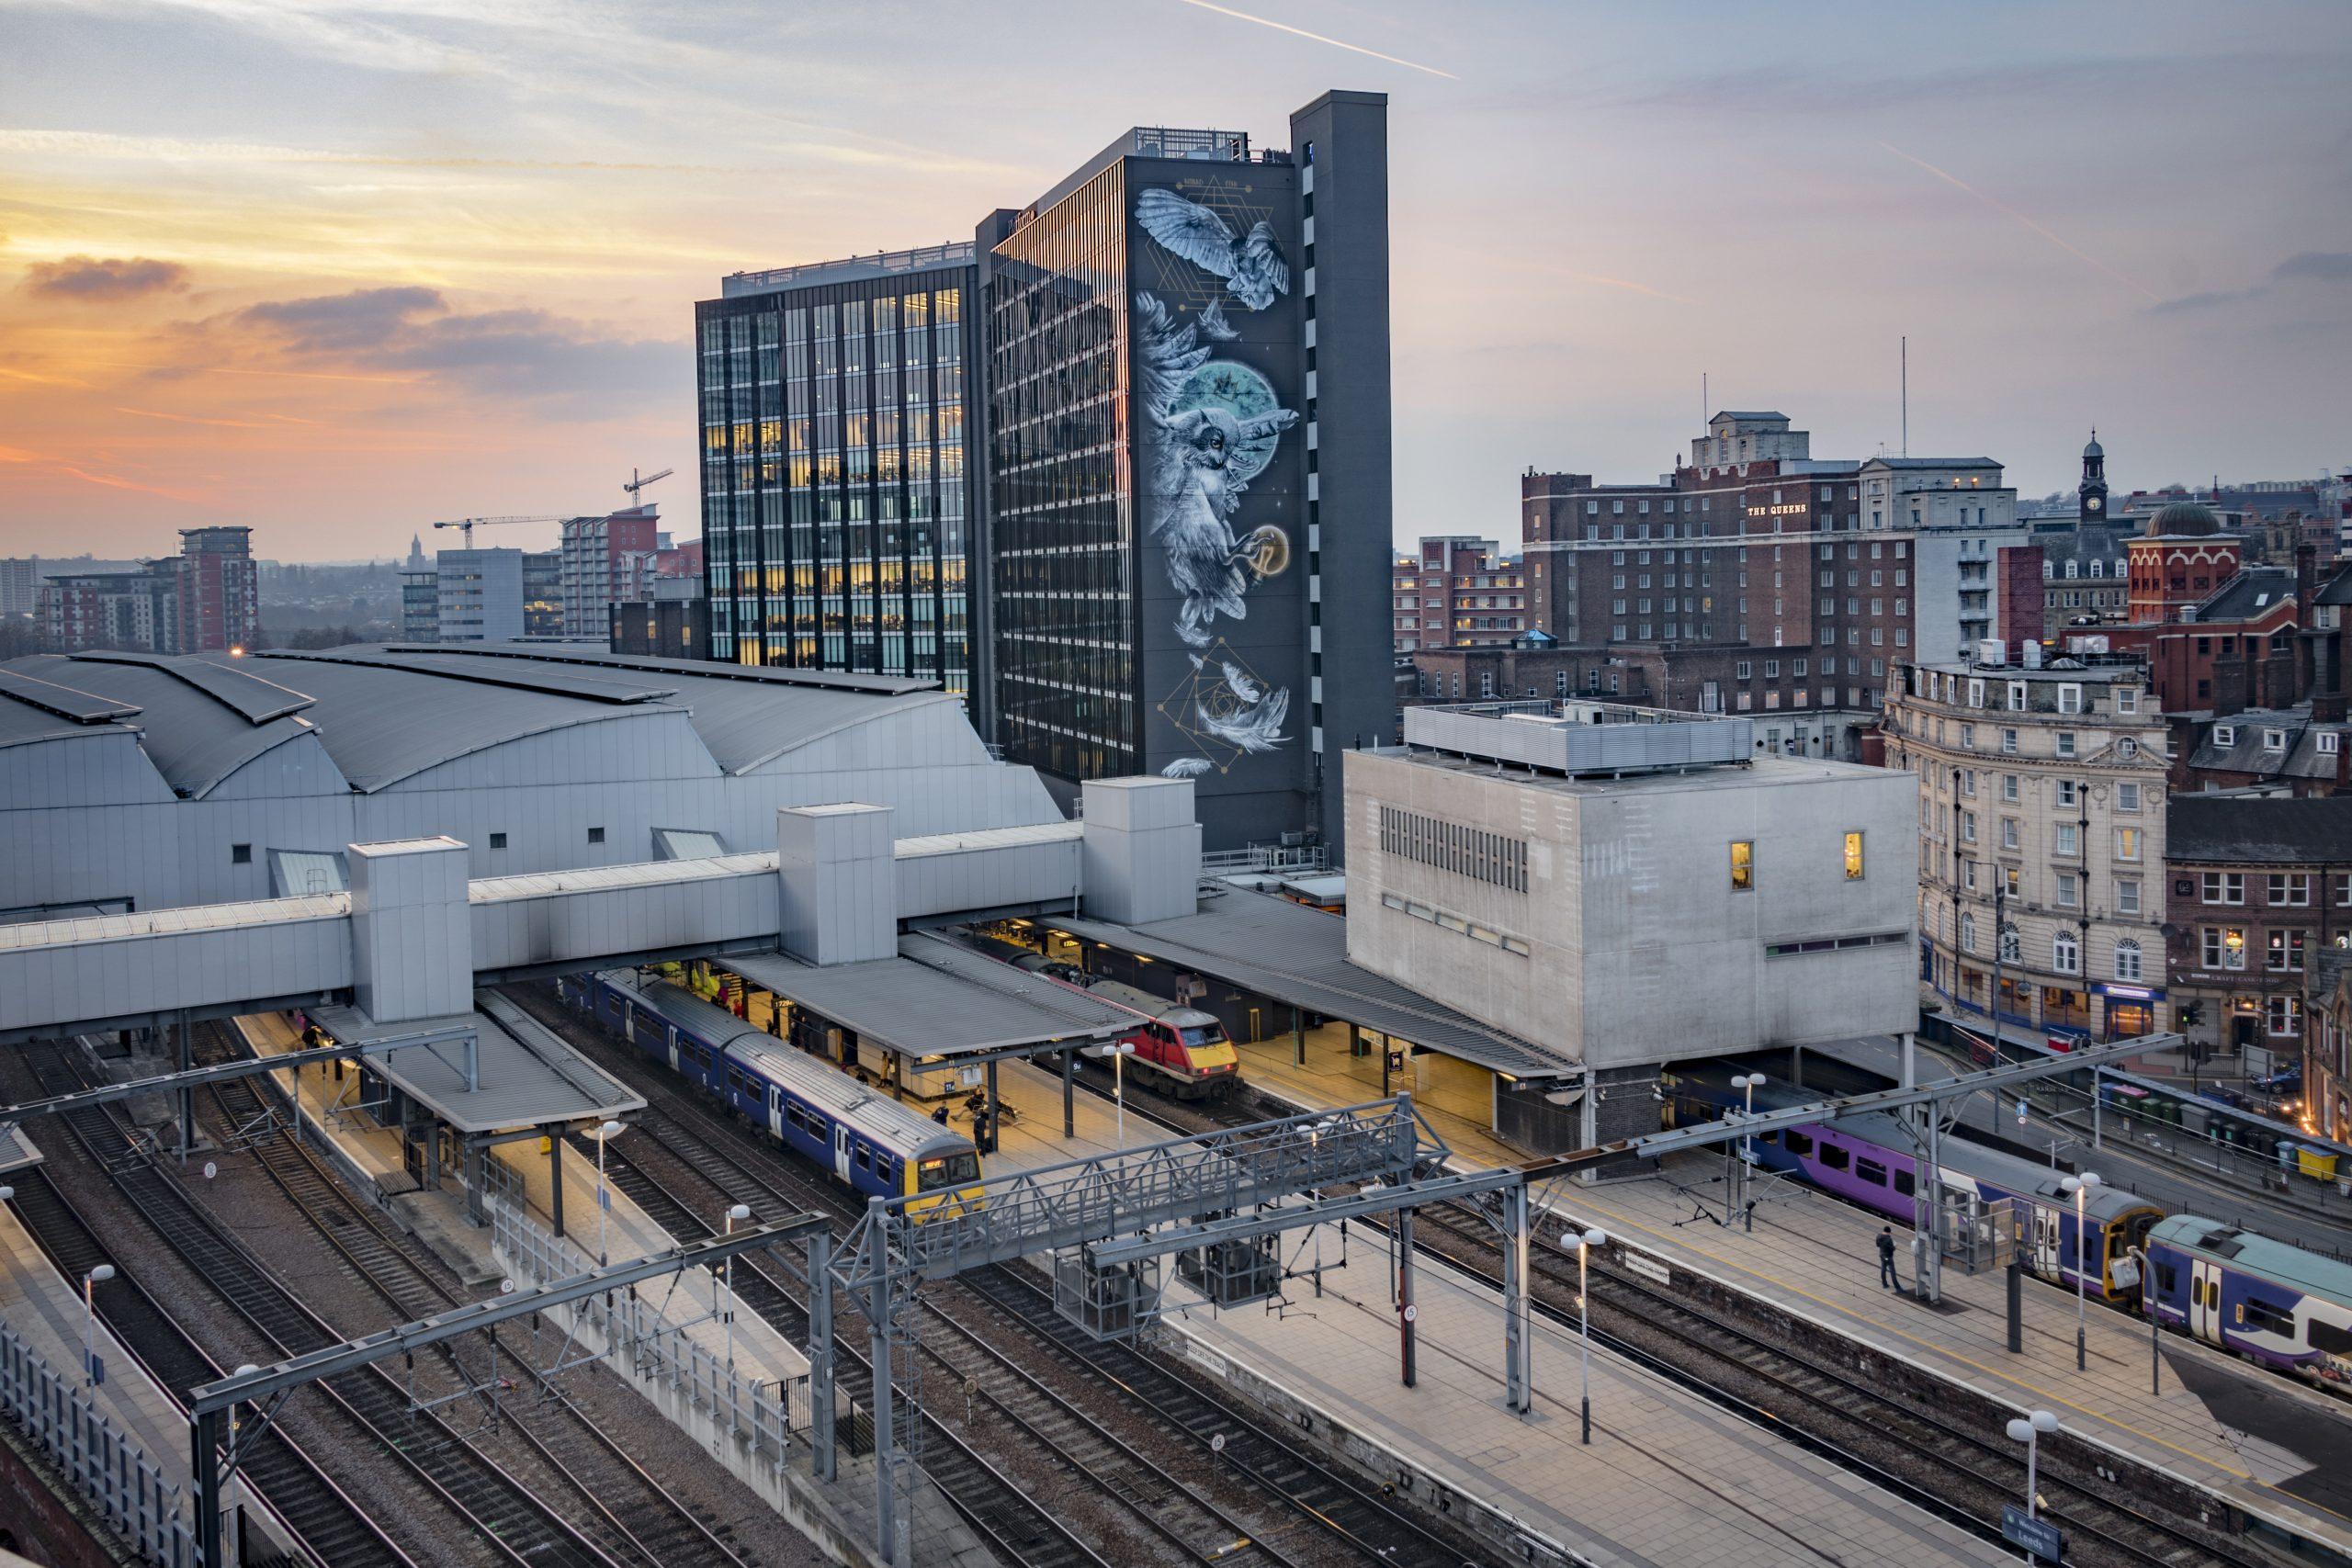 Leeds Station and Athena Rising Mural - Carl Milner Photography for VisitLeeds